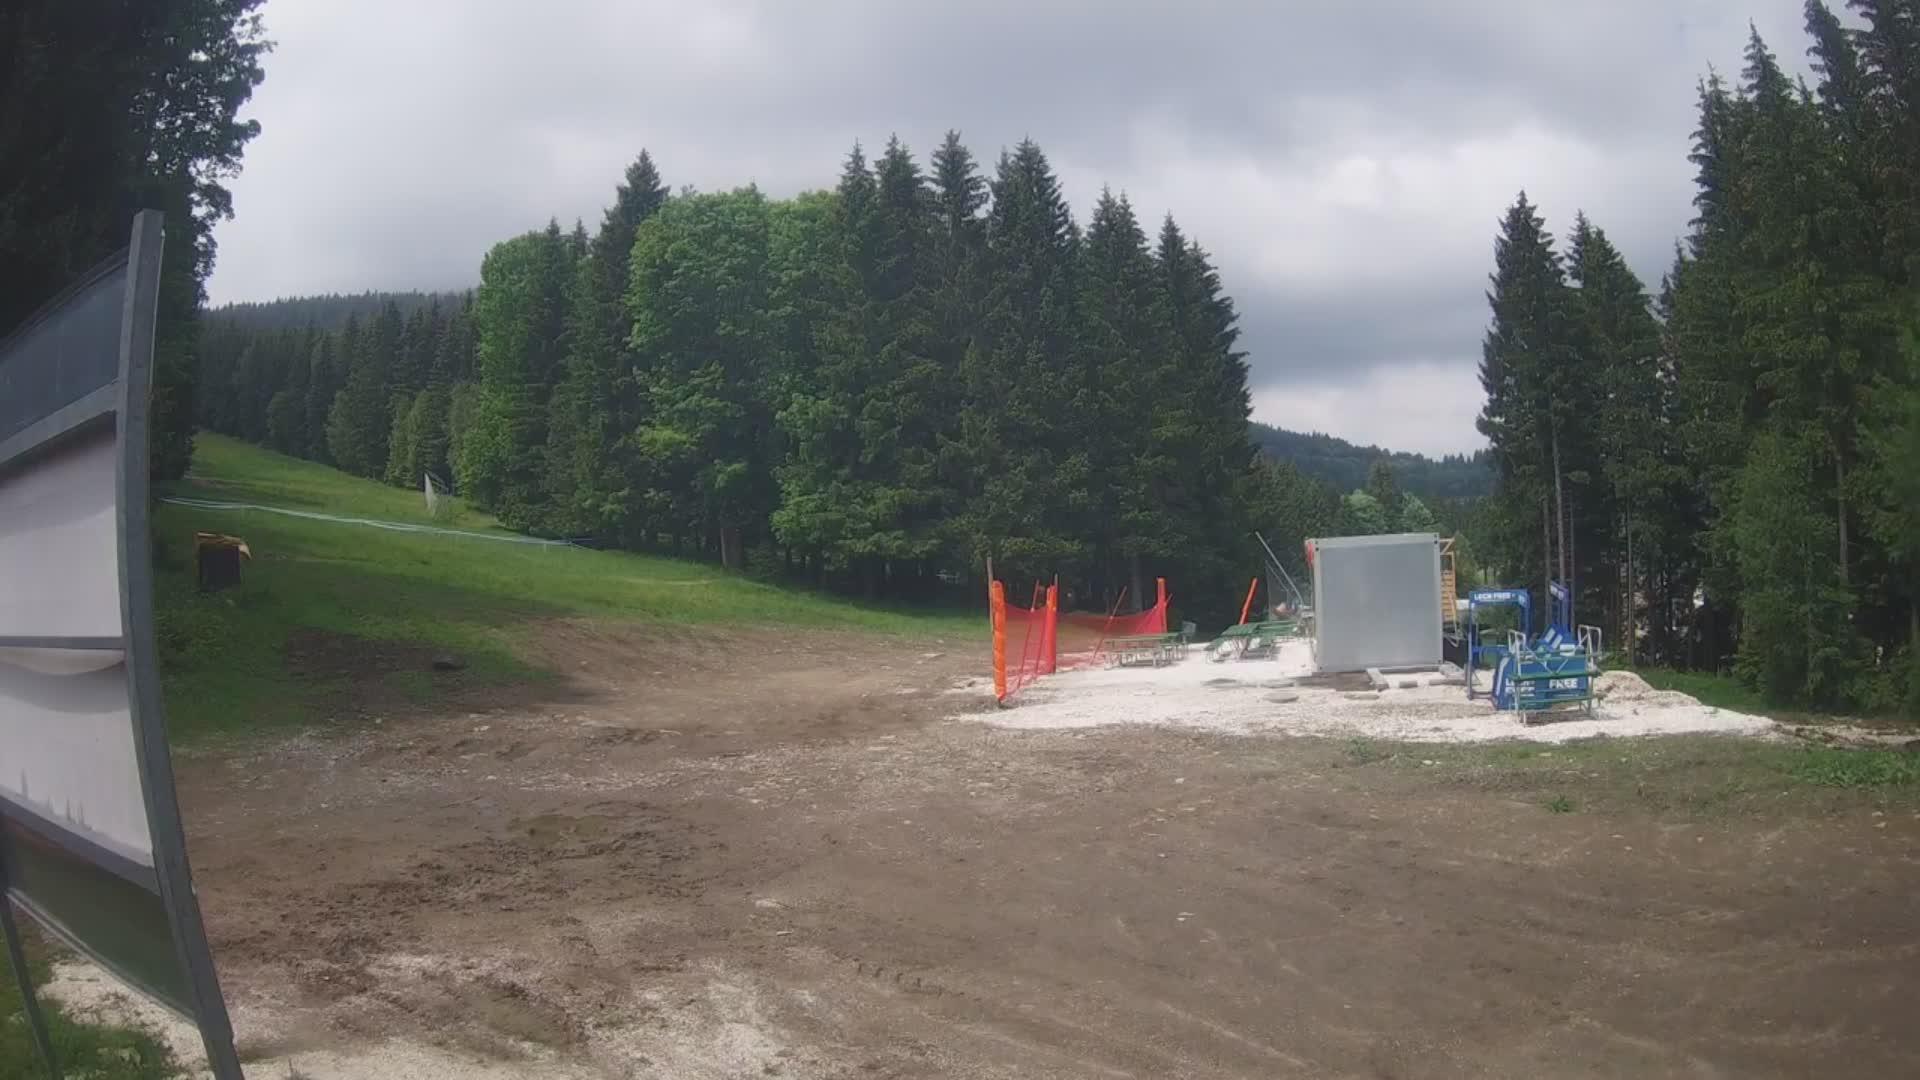 Webcam Skigebiet Czarna Gora cam 5 - Glatzer Schneegebirge